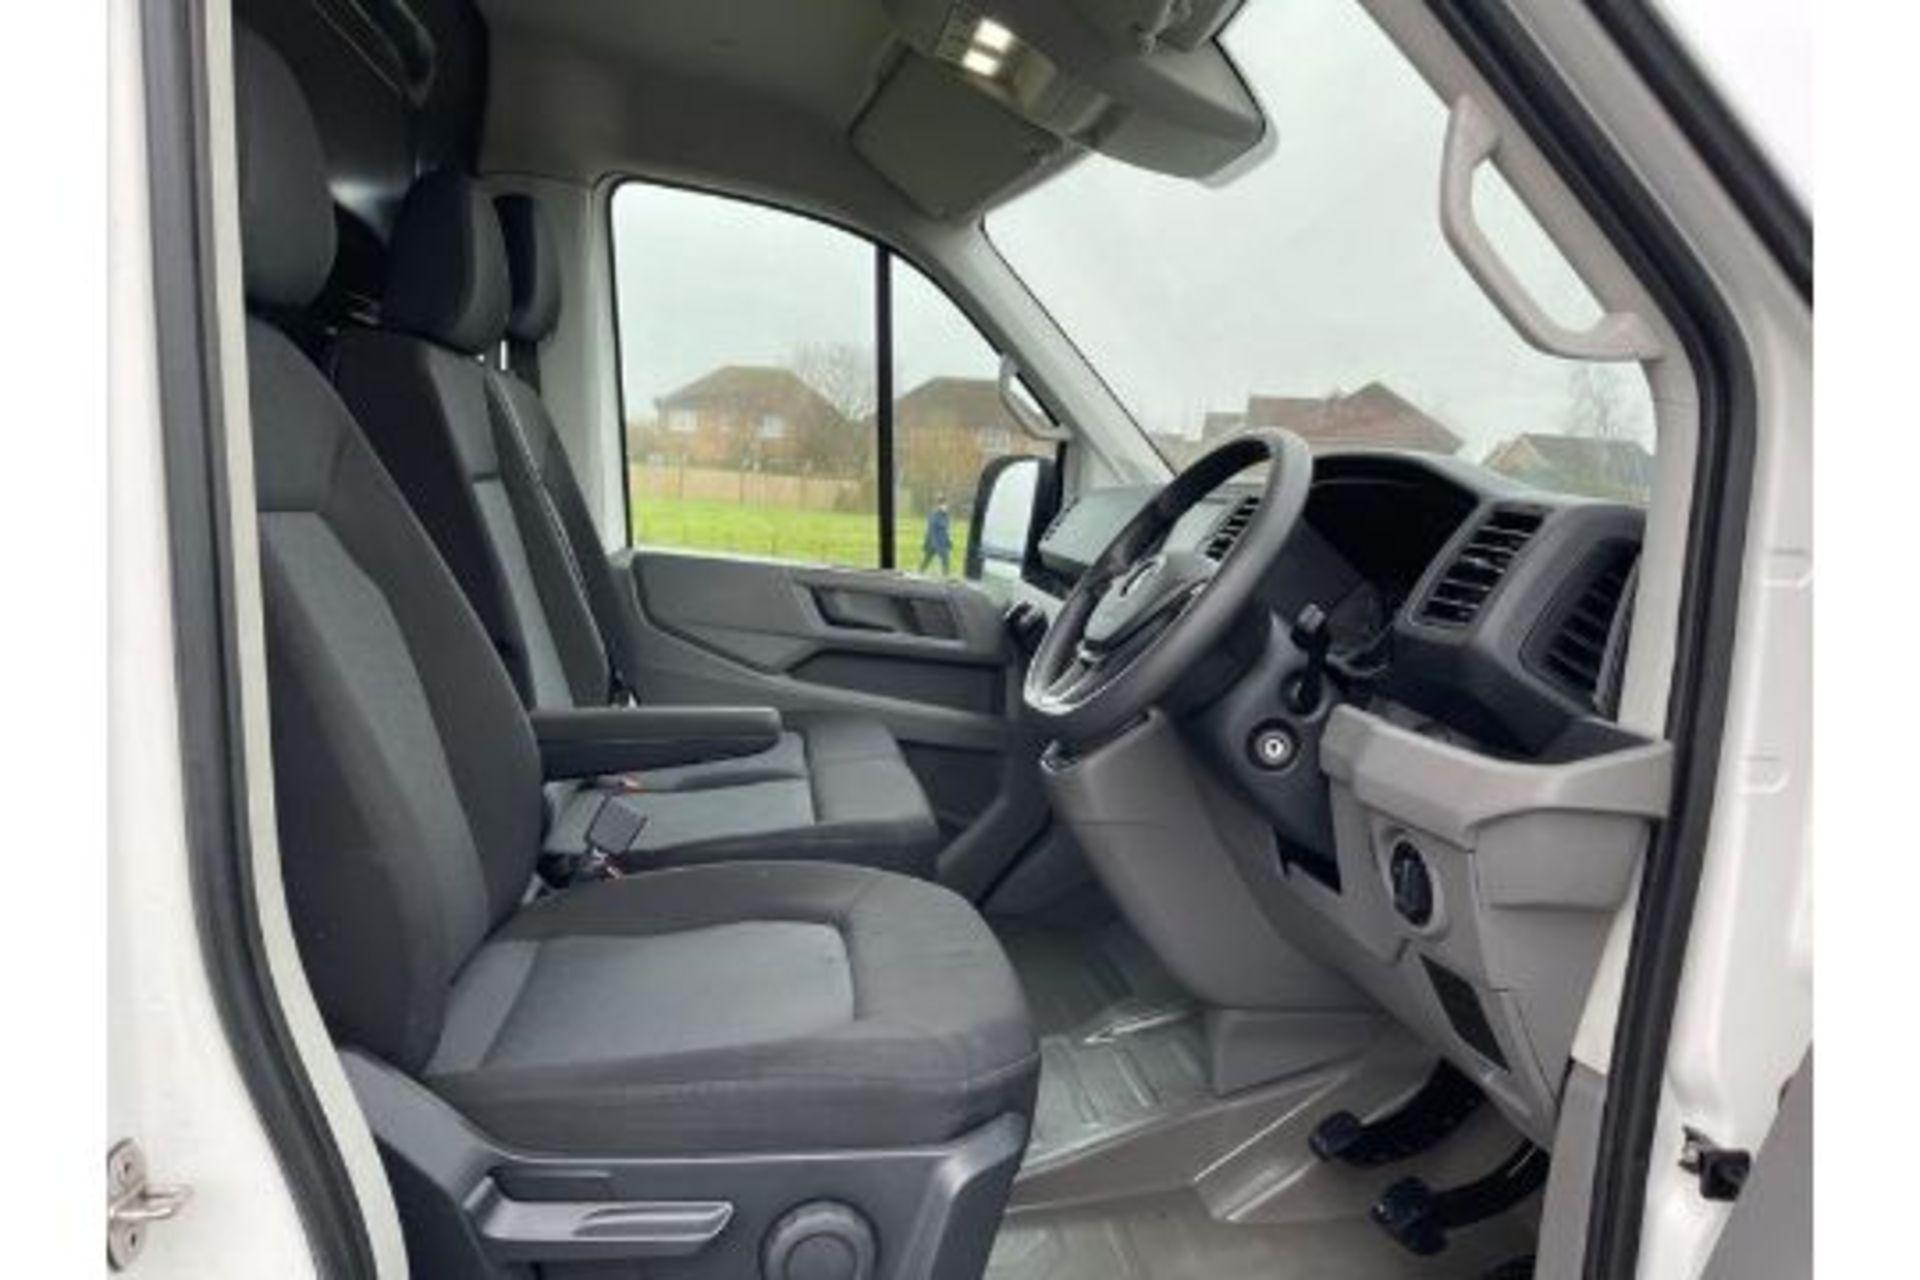 (Reserve Met) Volkswagen (VW) Crafter 2.0 TDI (140) Trendline -17 Reg- Euro 6 -Air Con- Low Miles - Image 3 of 3